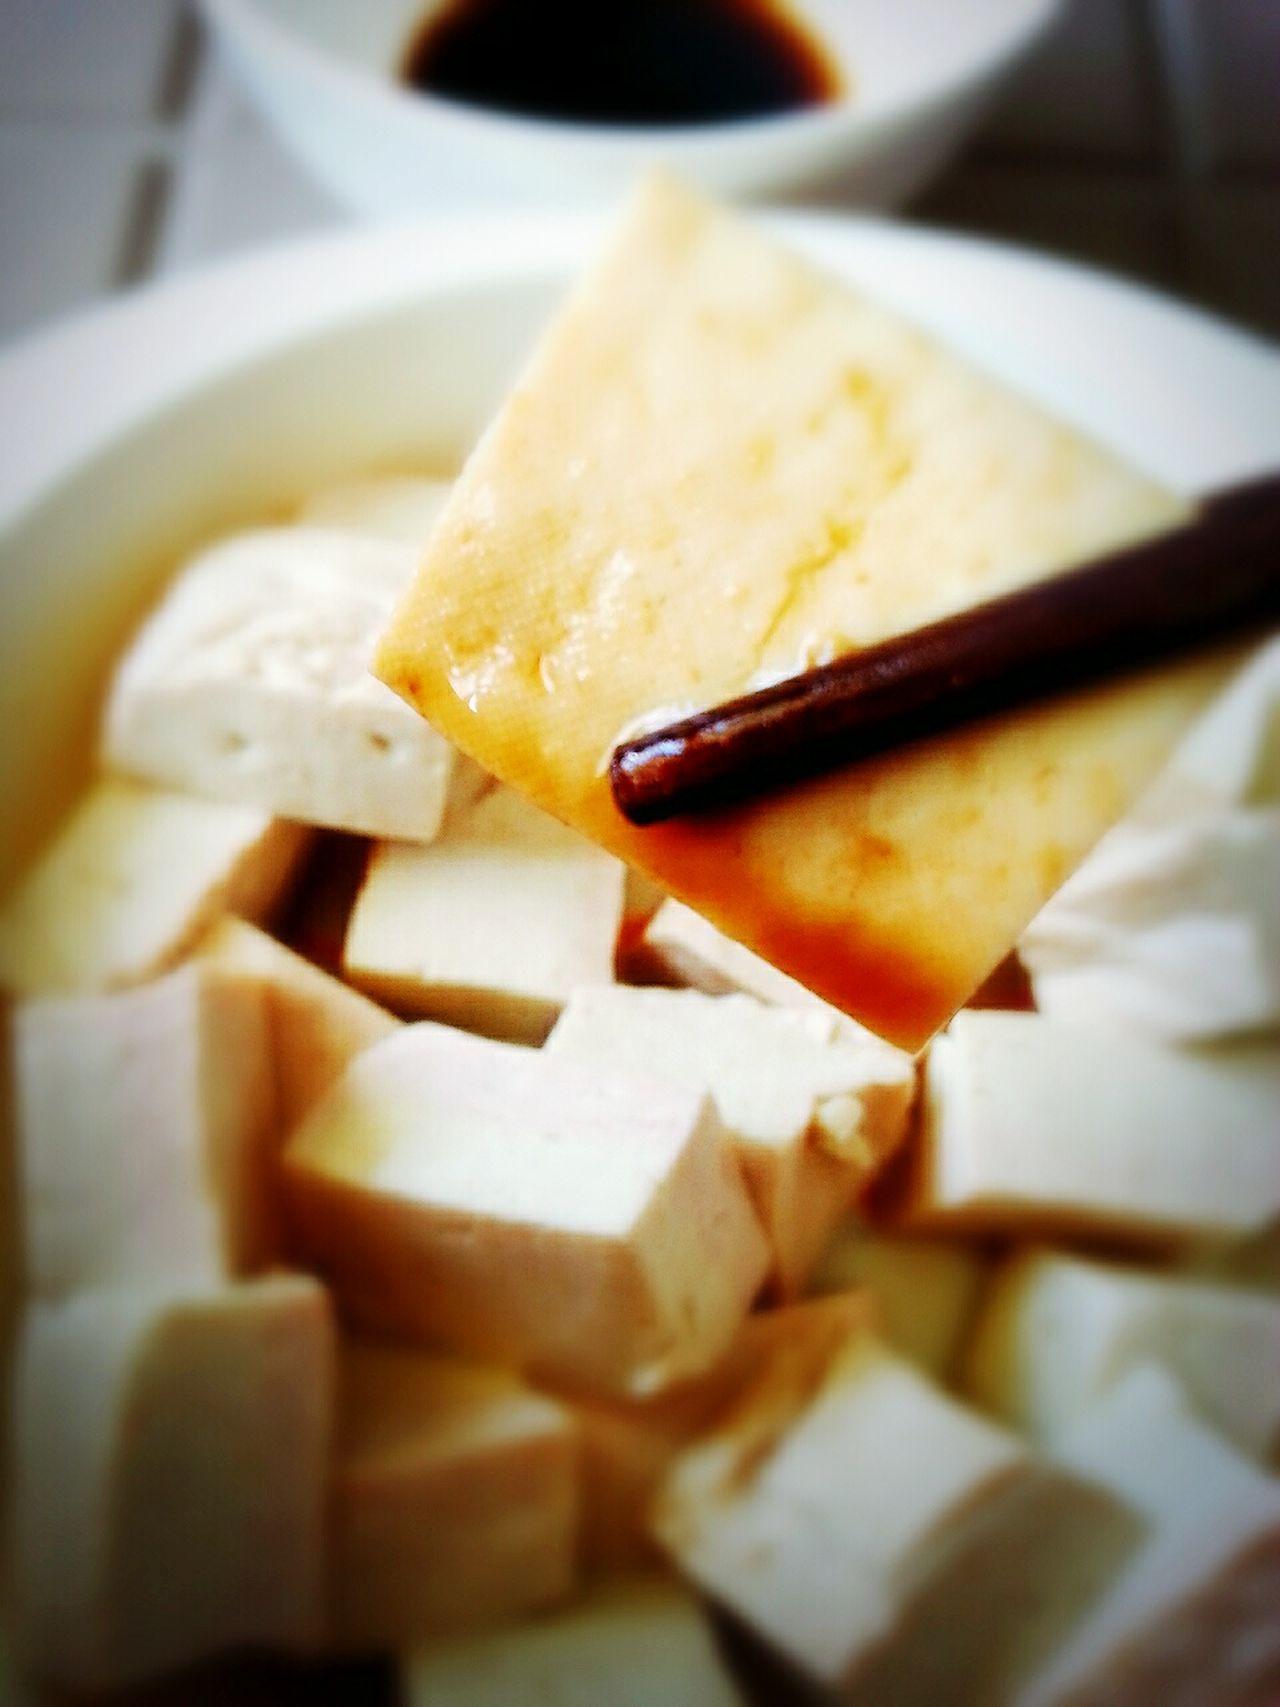 Toufu..เต้าหู้จิ้มซีอิ้ว อร่อยเบาๆโคตรๆ ดีต่อสุขภาพเช้าๆอย่างนี้จัดเลย ดีกับทุกคน Taufu Good Morning Bangkok Thailand. เต้าหู้ไข่ สุขภาพคือสิ่งที่เงินซื้อไม่ได้ Healthy Food Ajarnjo Hi! Helloworld Foodphotography